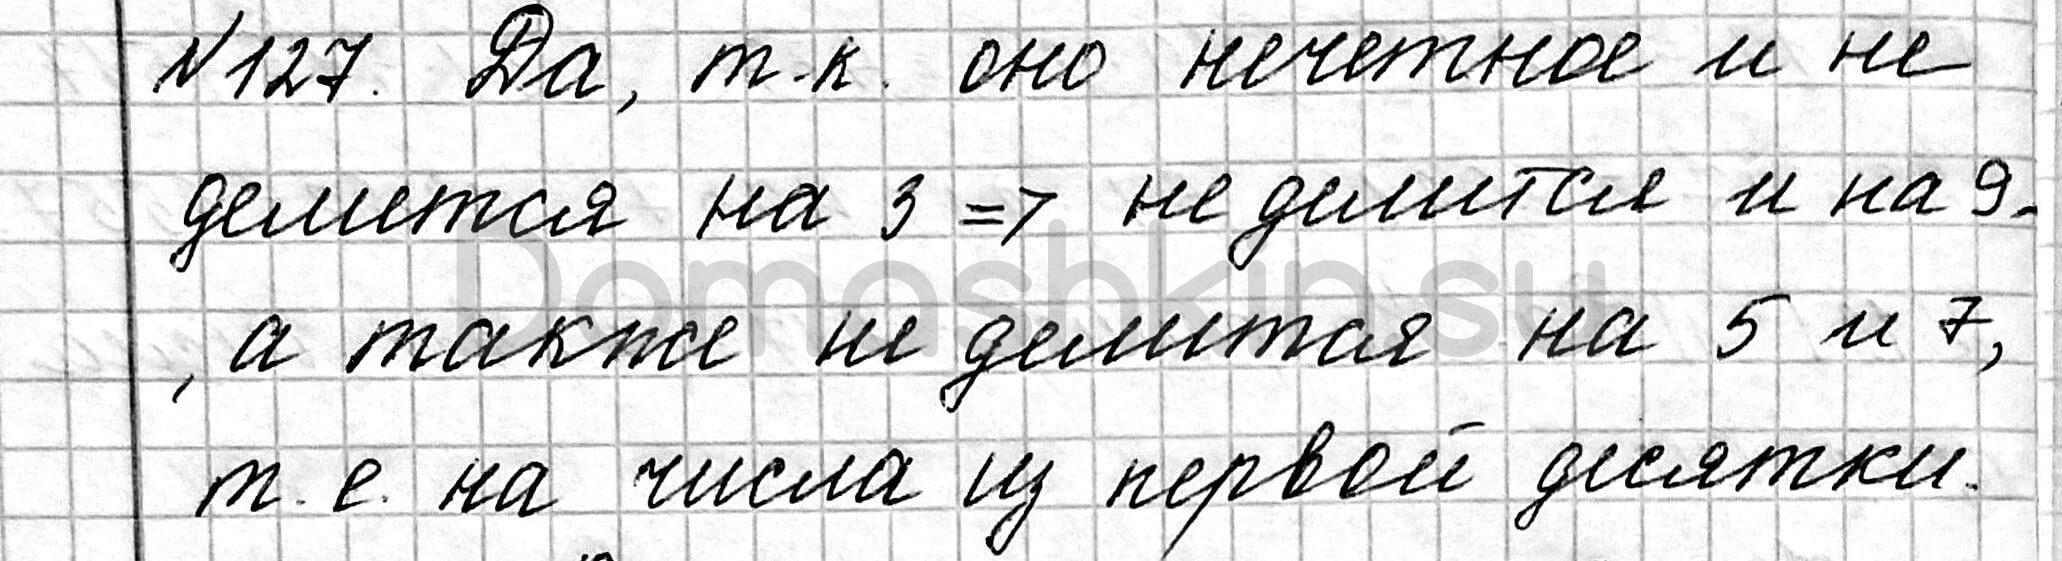 Математика 6 класс учебник Мерзляк номер 127 решение